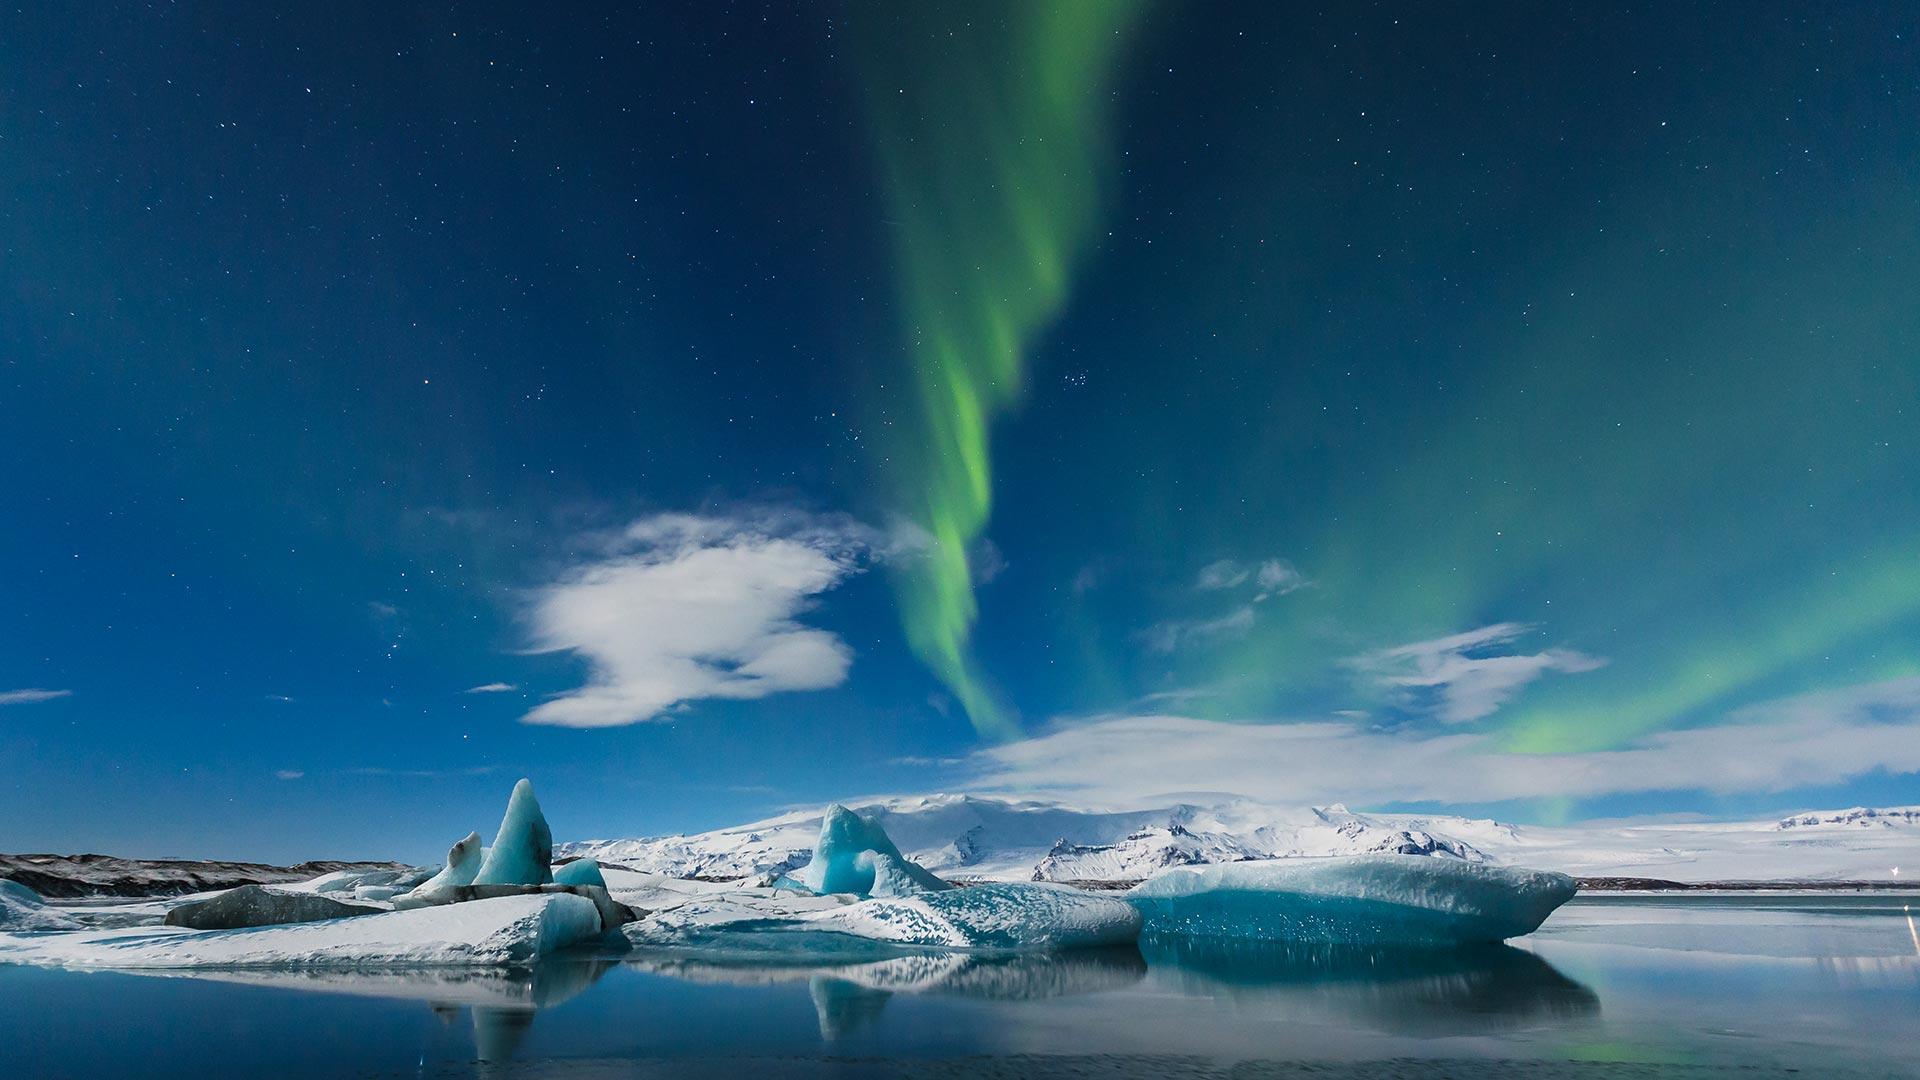 Jokulsarlon Glacier Lagoon Iceland Information And Tours